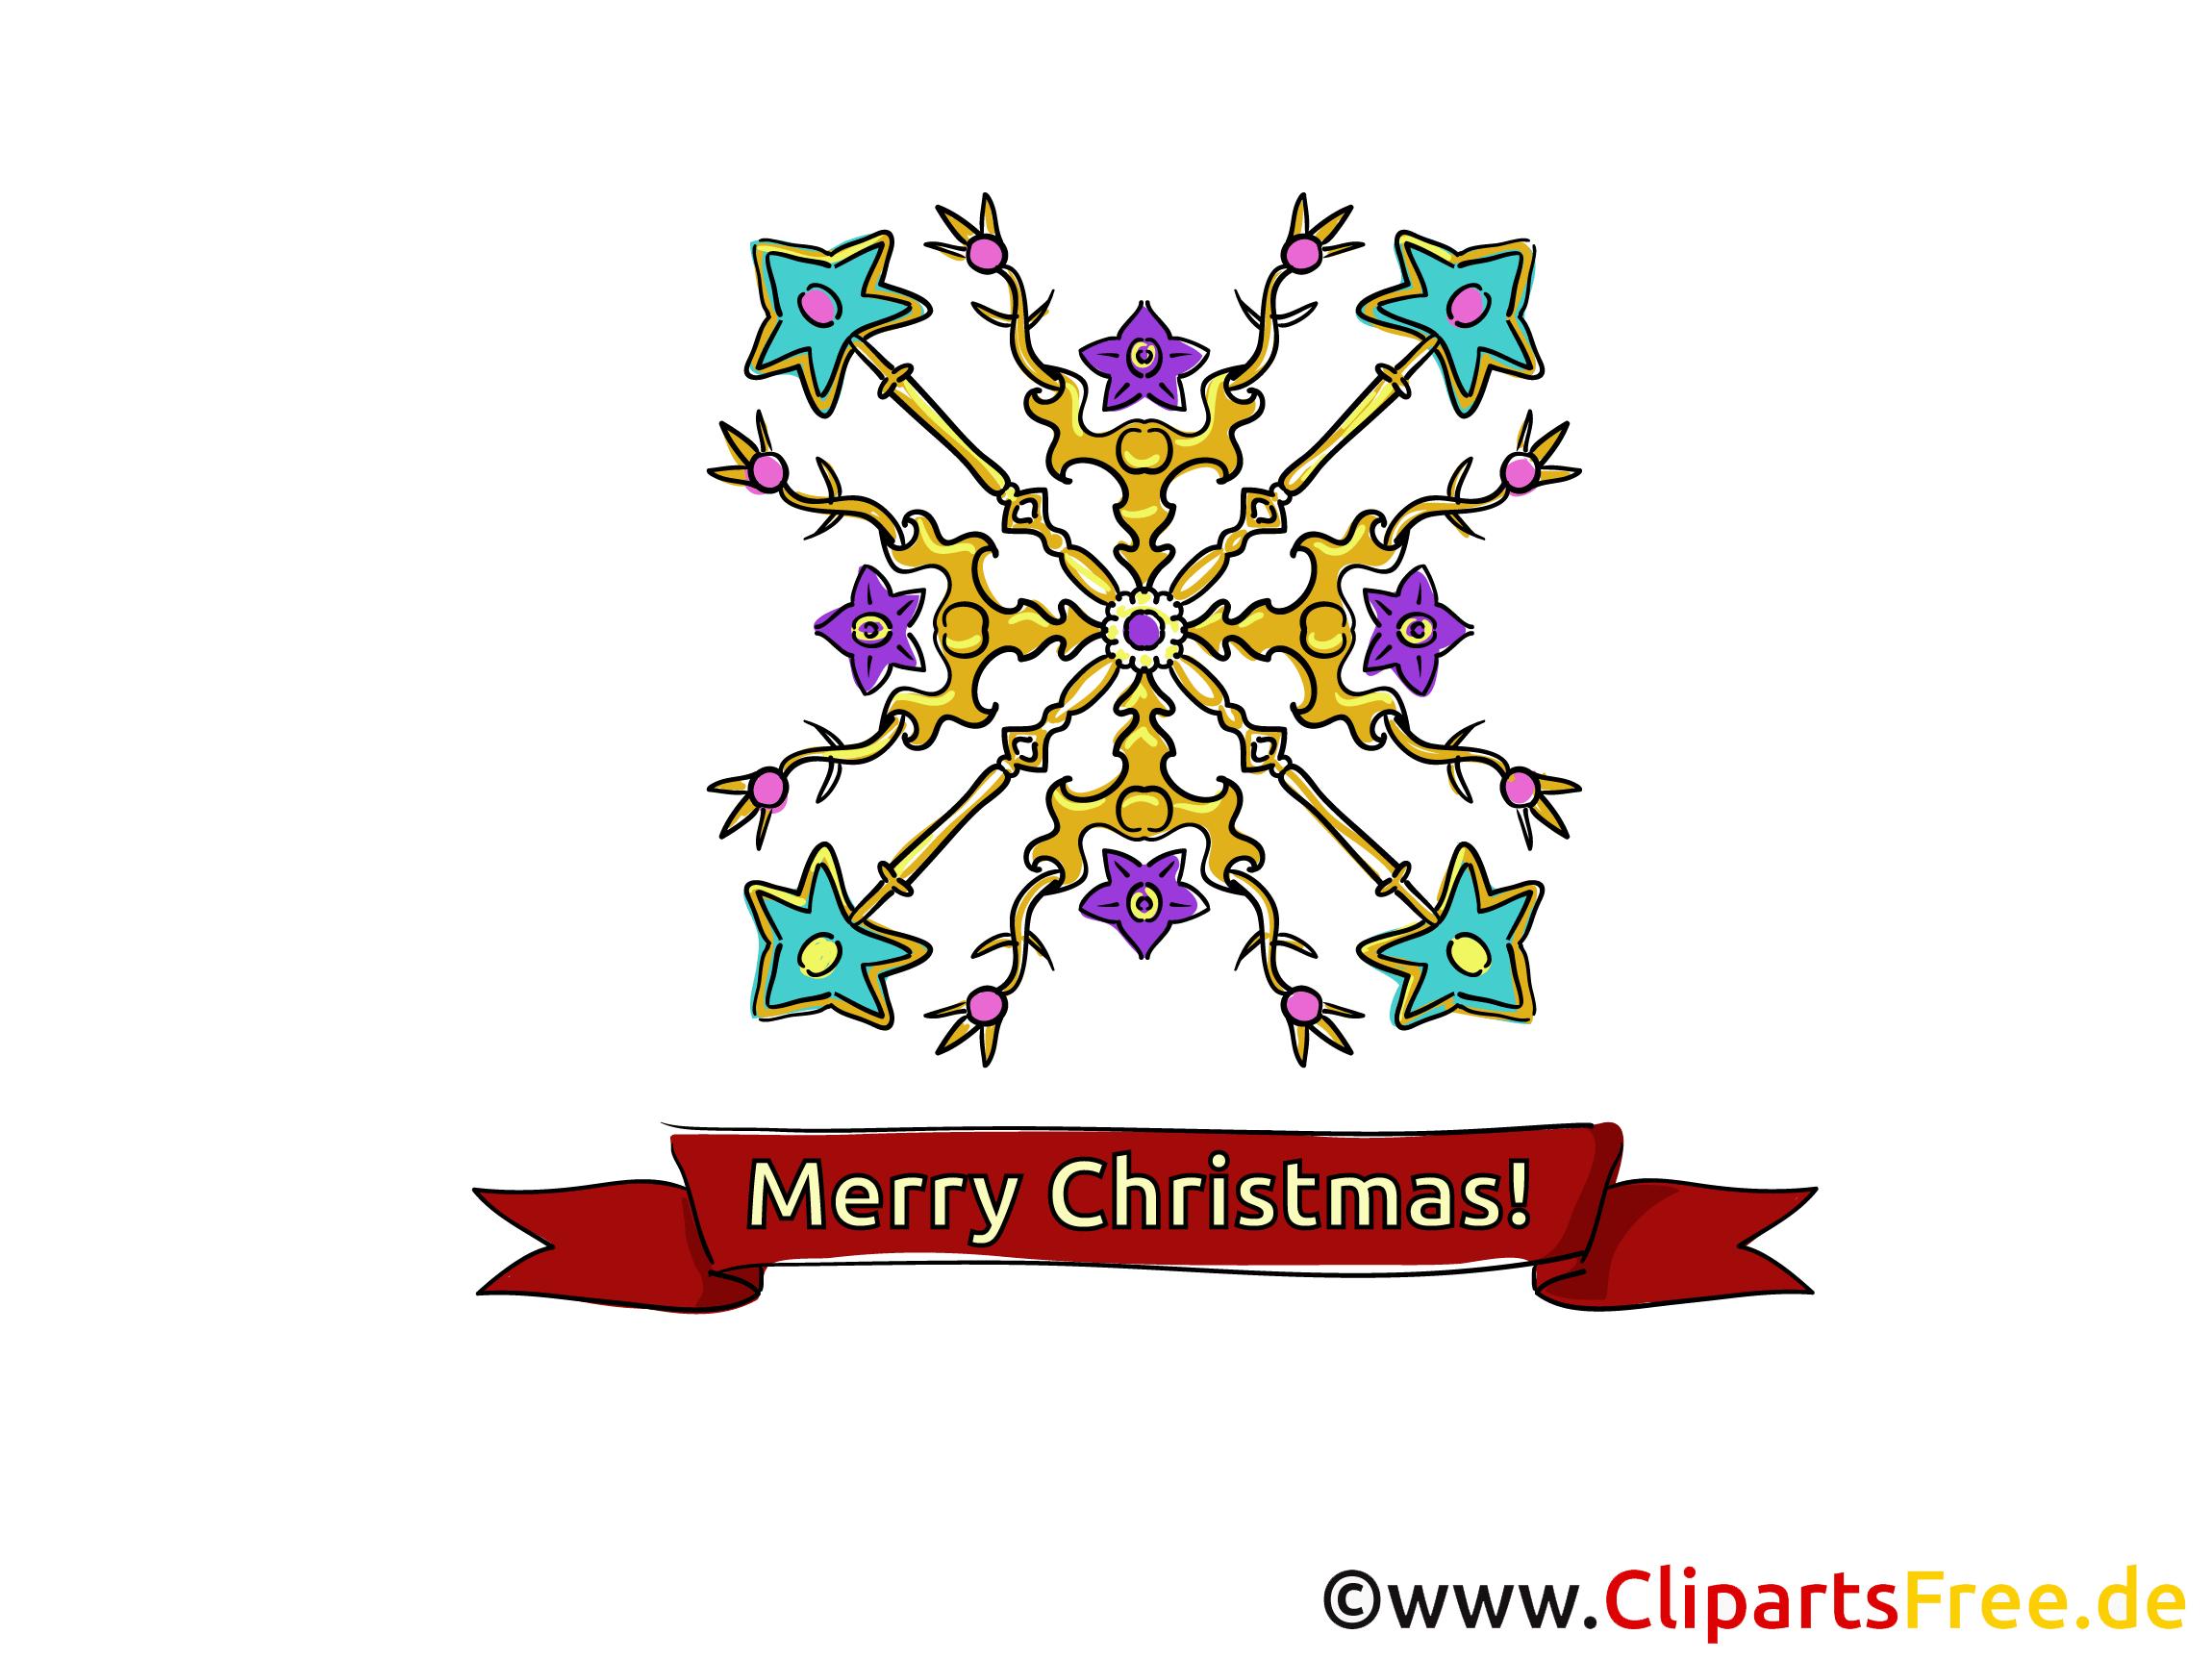 Weihnachtsstern Clipart, eCard, Bild per E-Mail verschicken - Merry ...